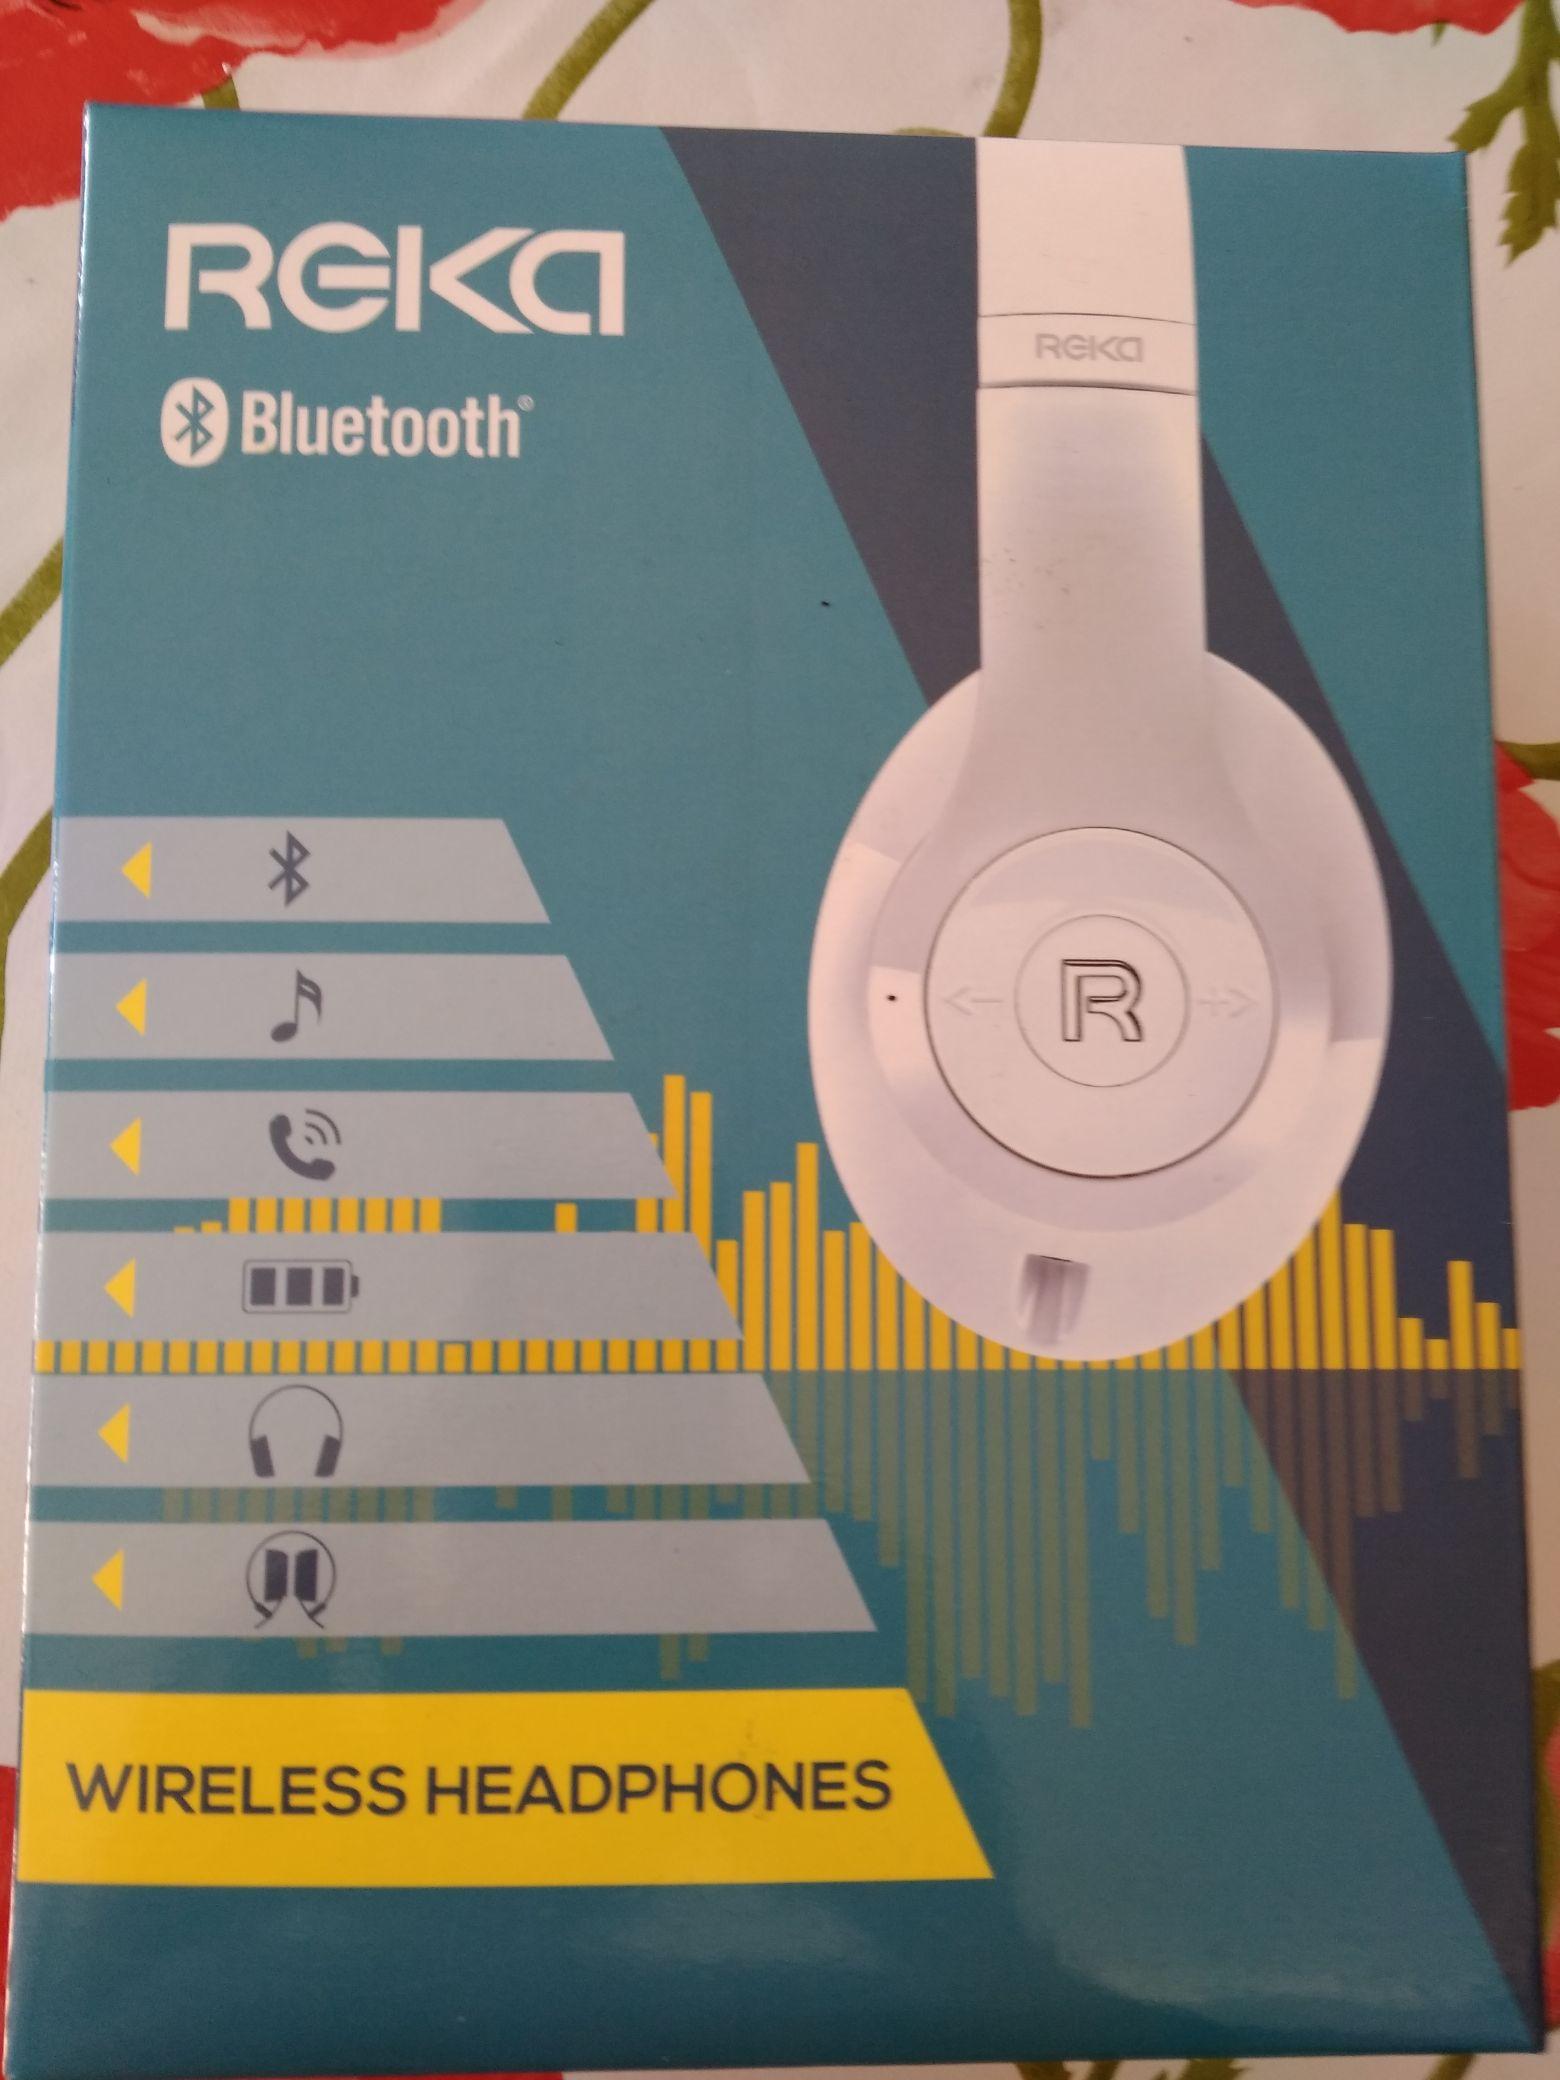 Reka Bluetooth headphones £4.99 at Aldi